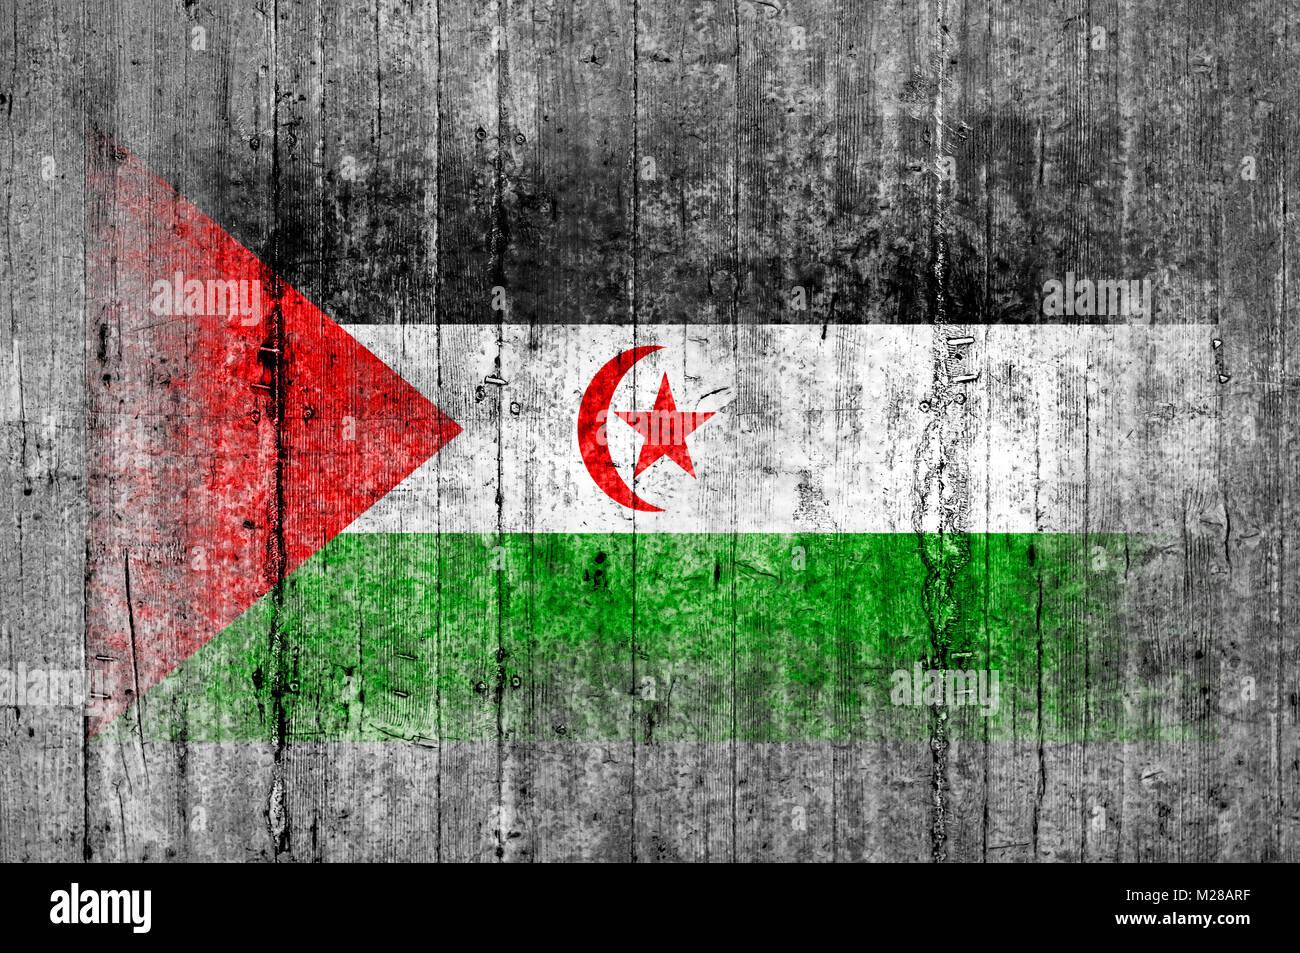 Sahrawi Arab Democratic Republic flag painted on background texture gray concrete - Stock Image